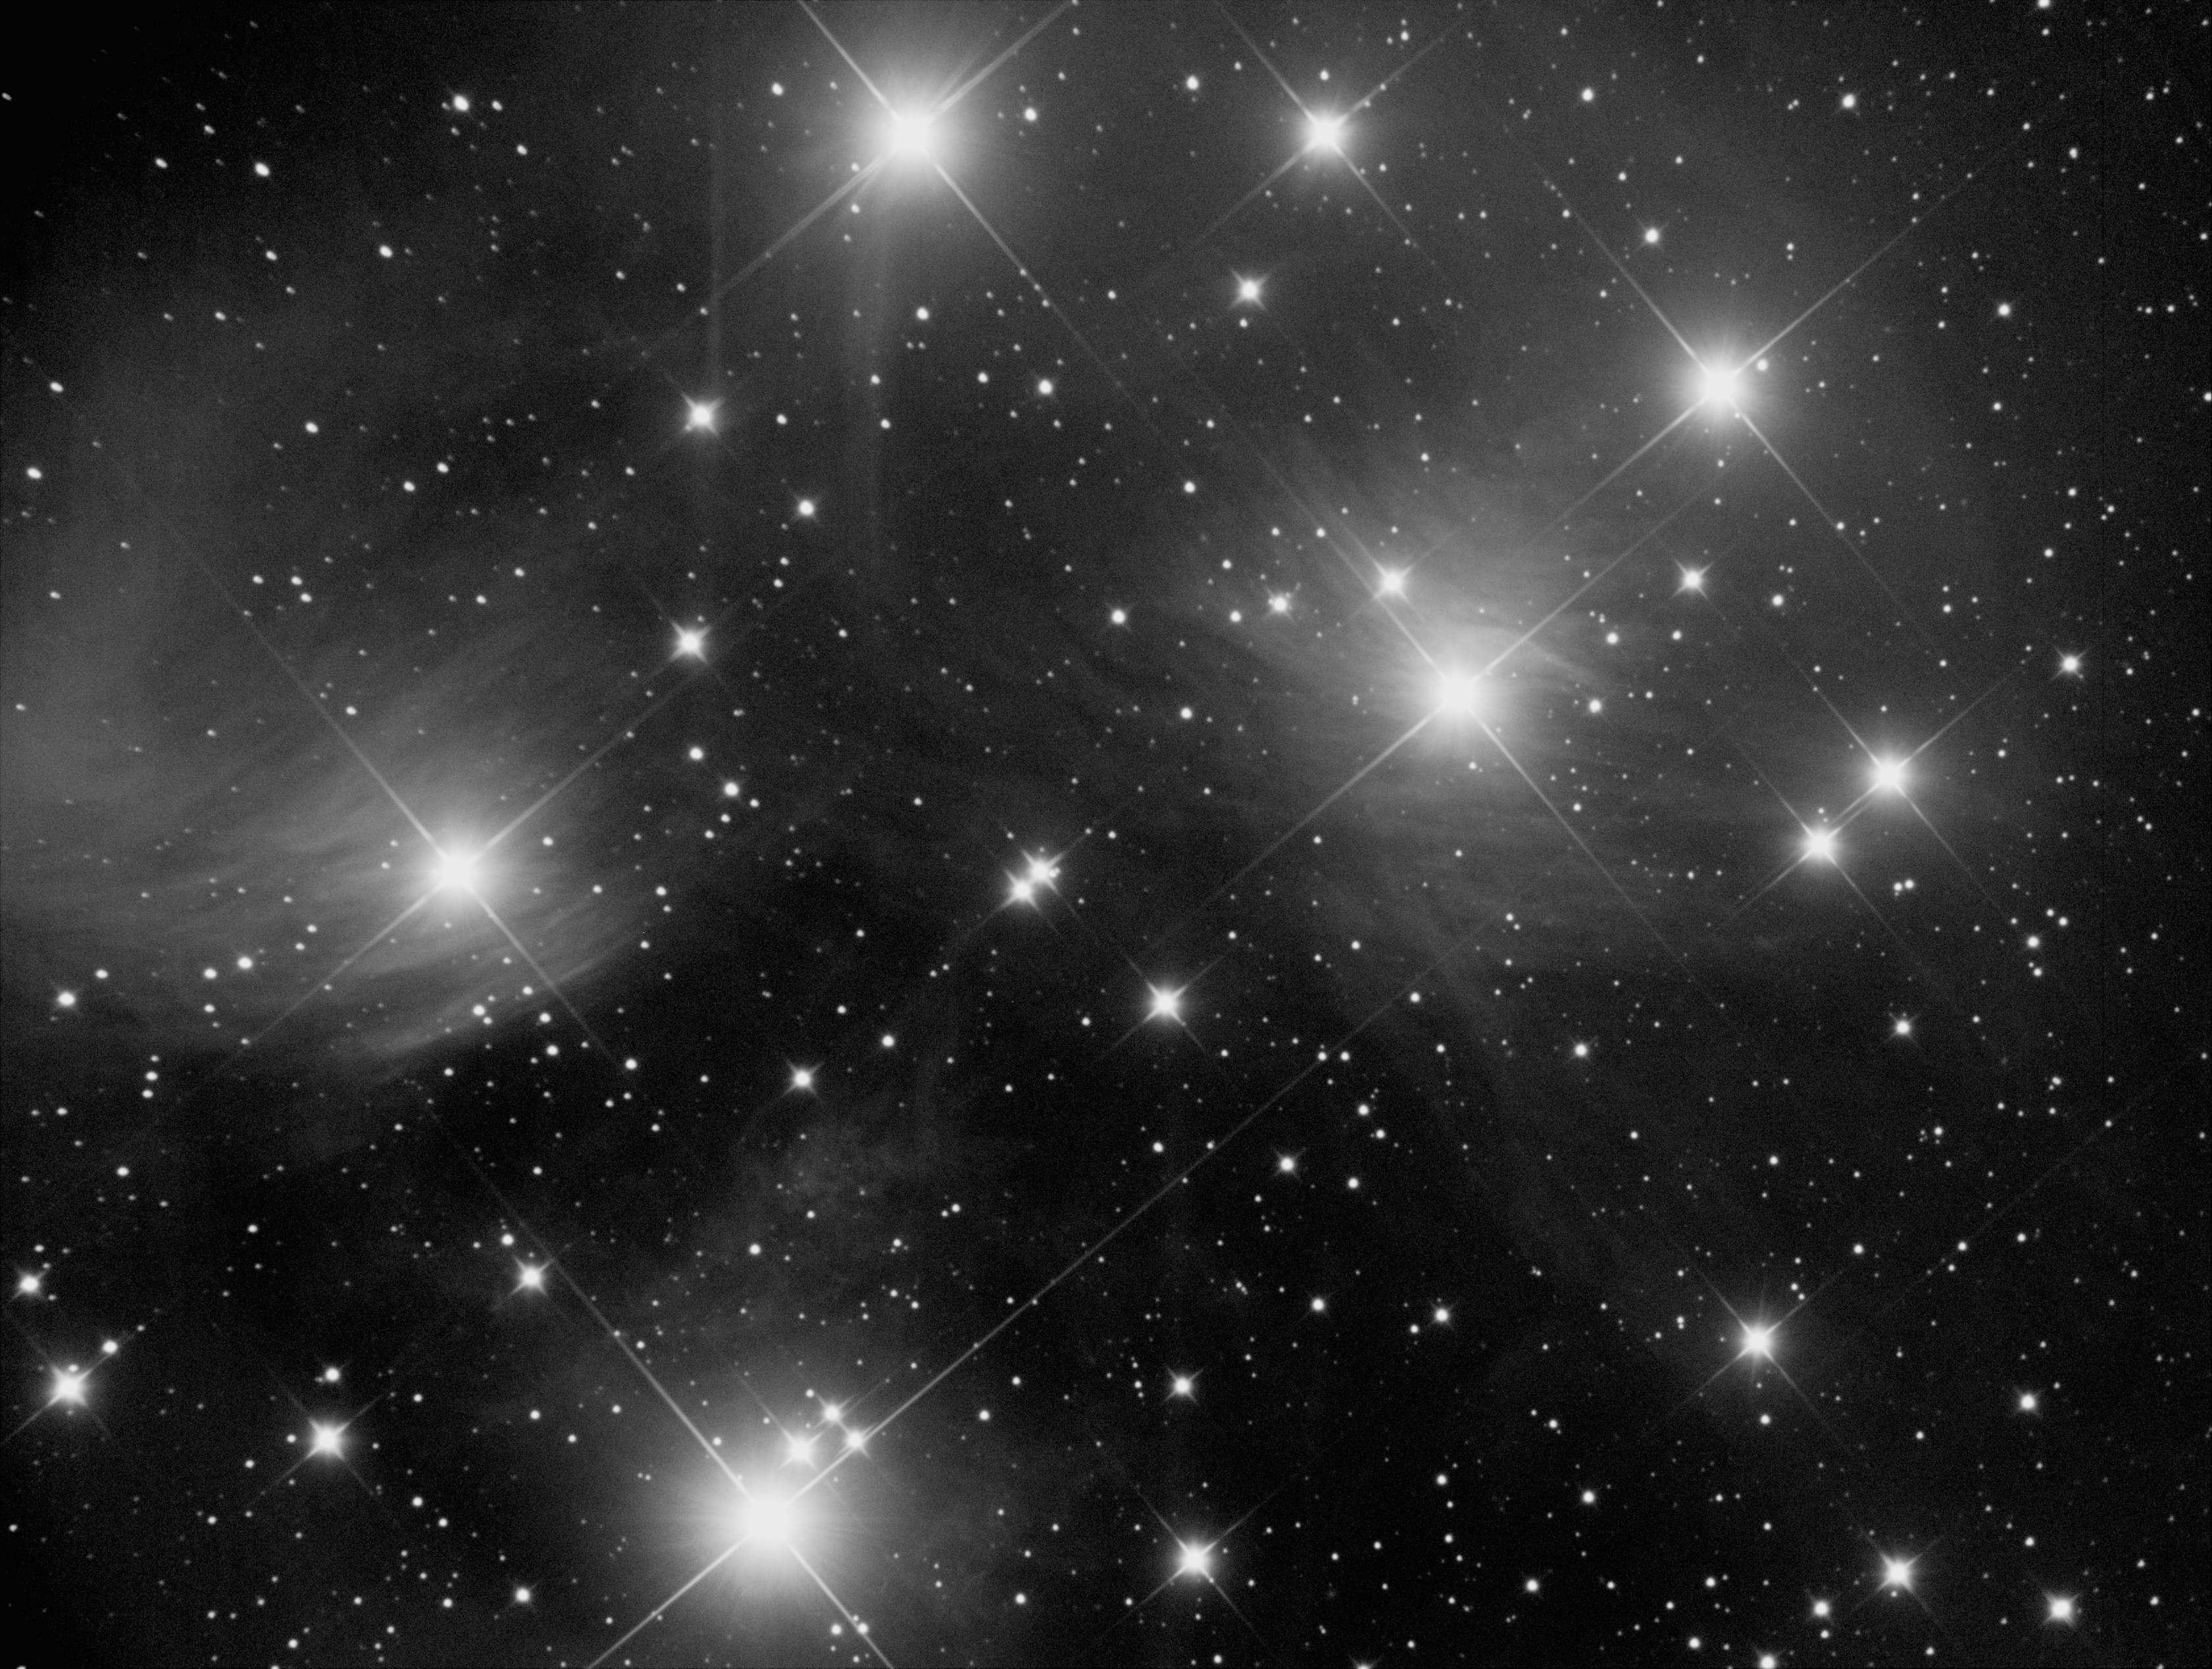 Nébuleuse d 'Orion luminance